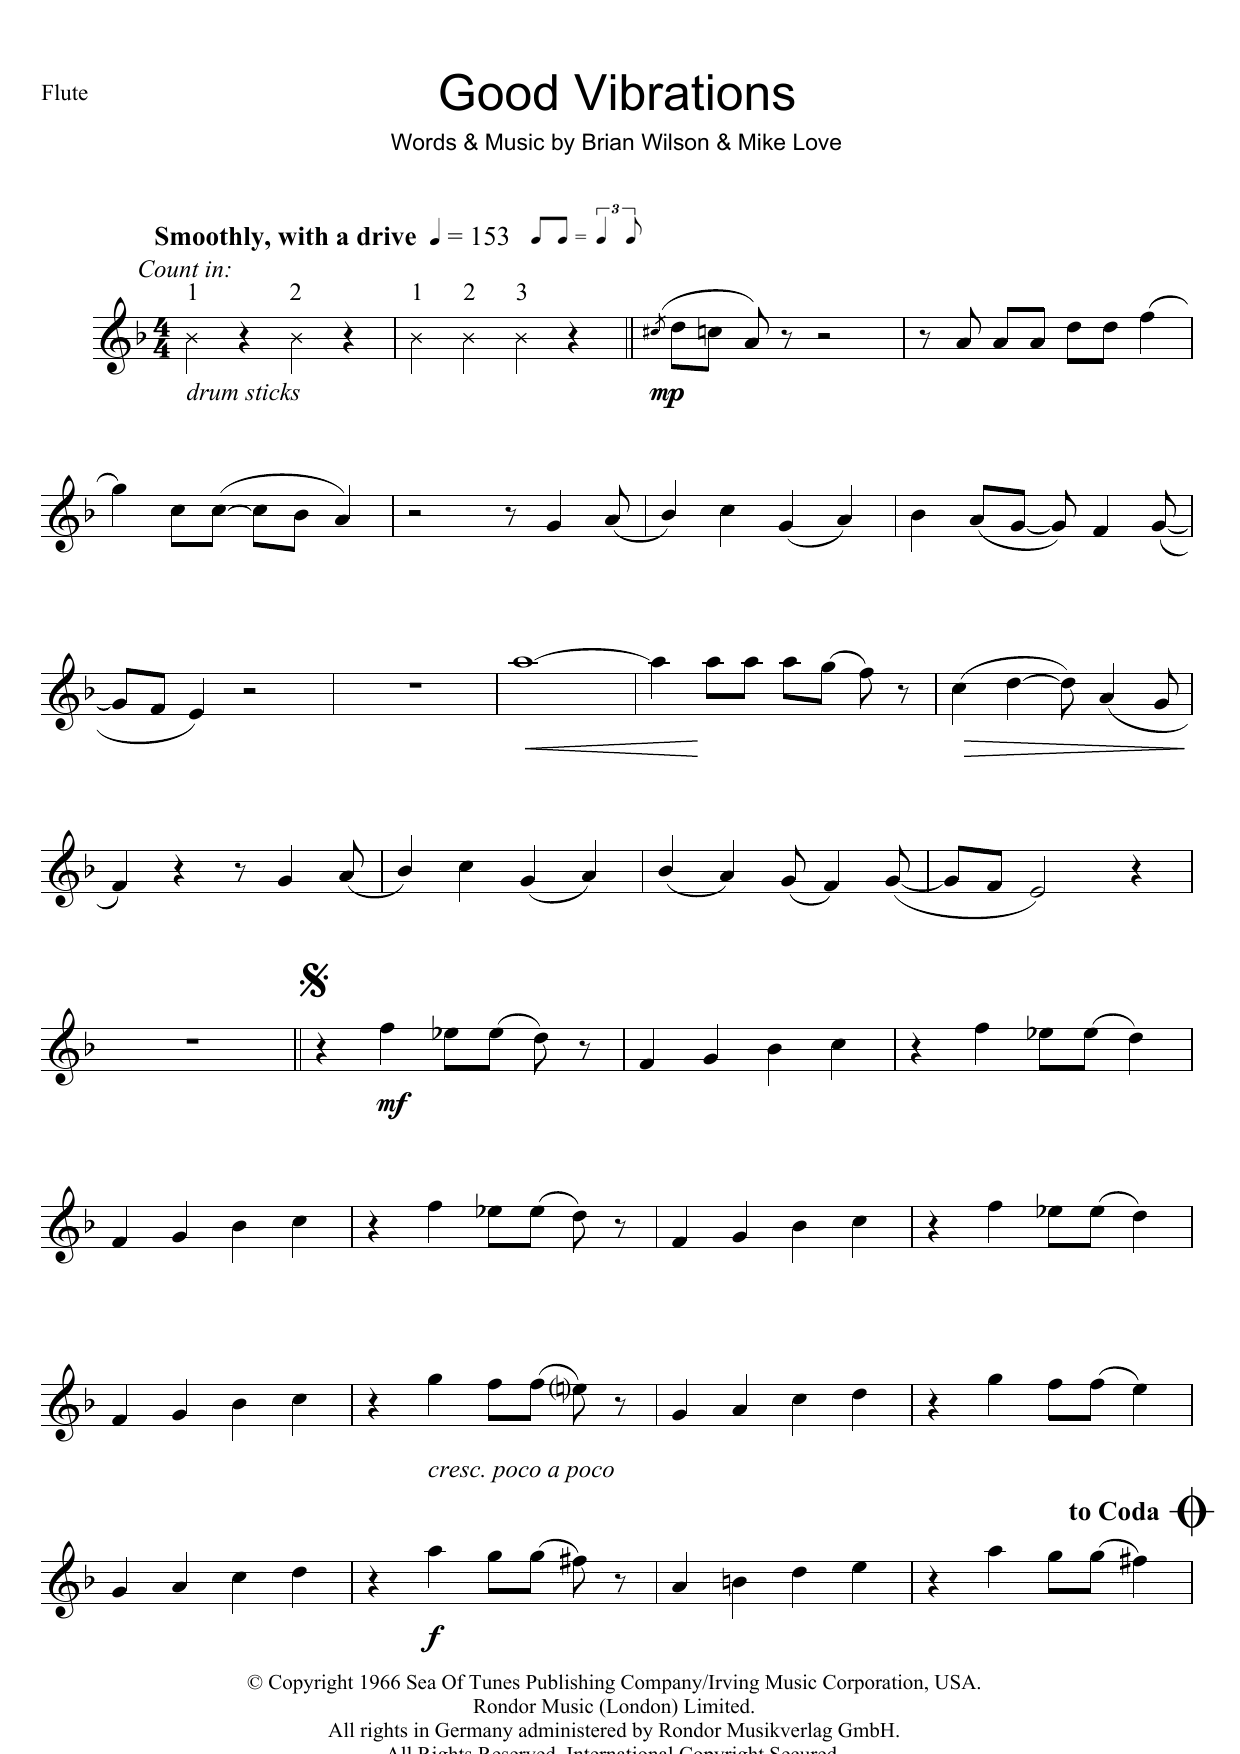 Good Vibrations Sheet Music